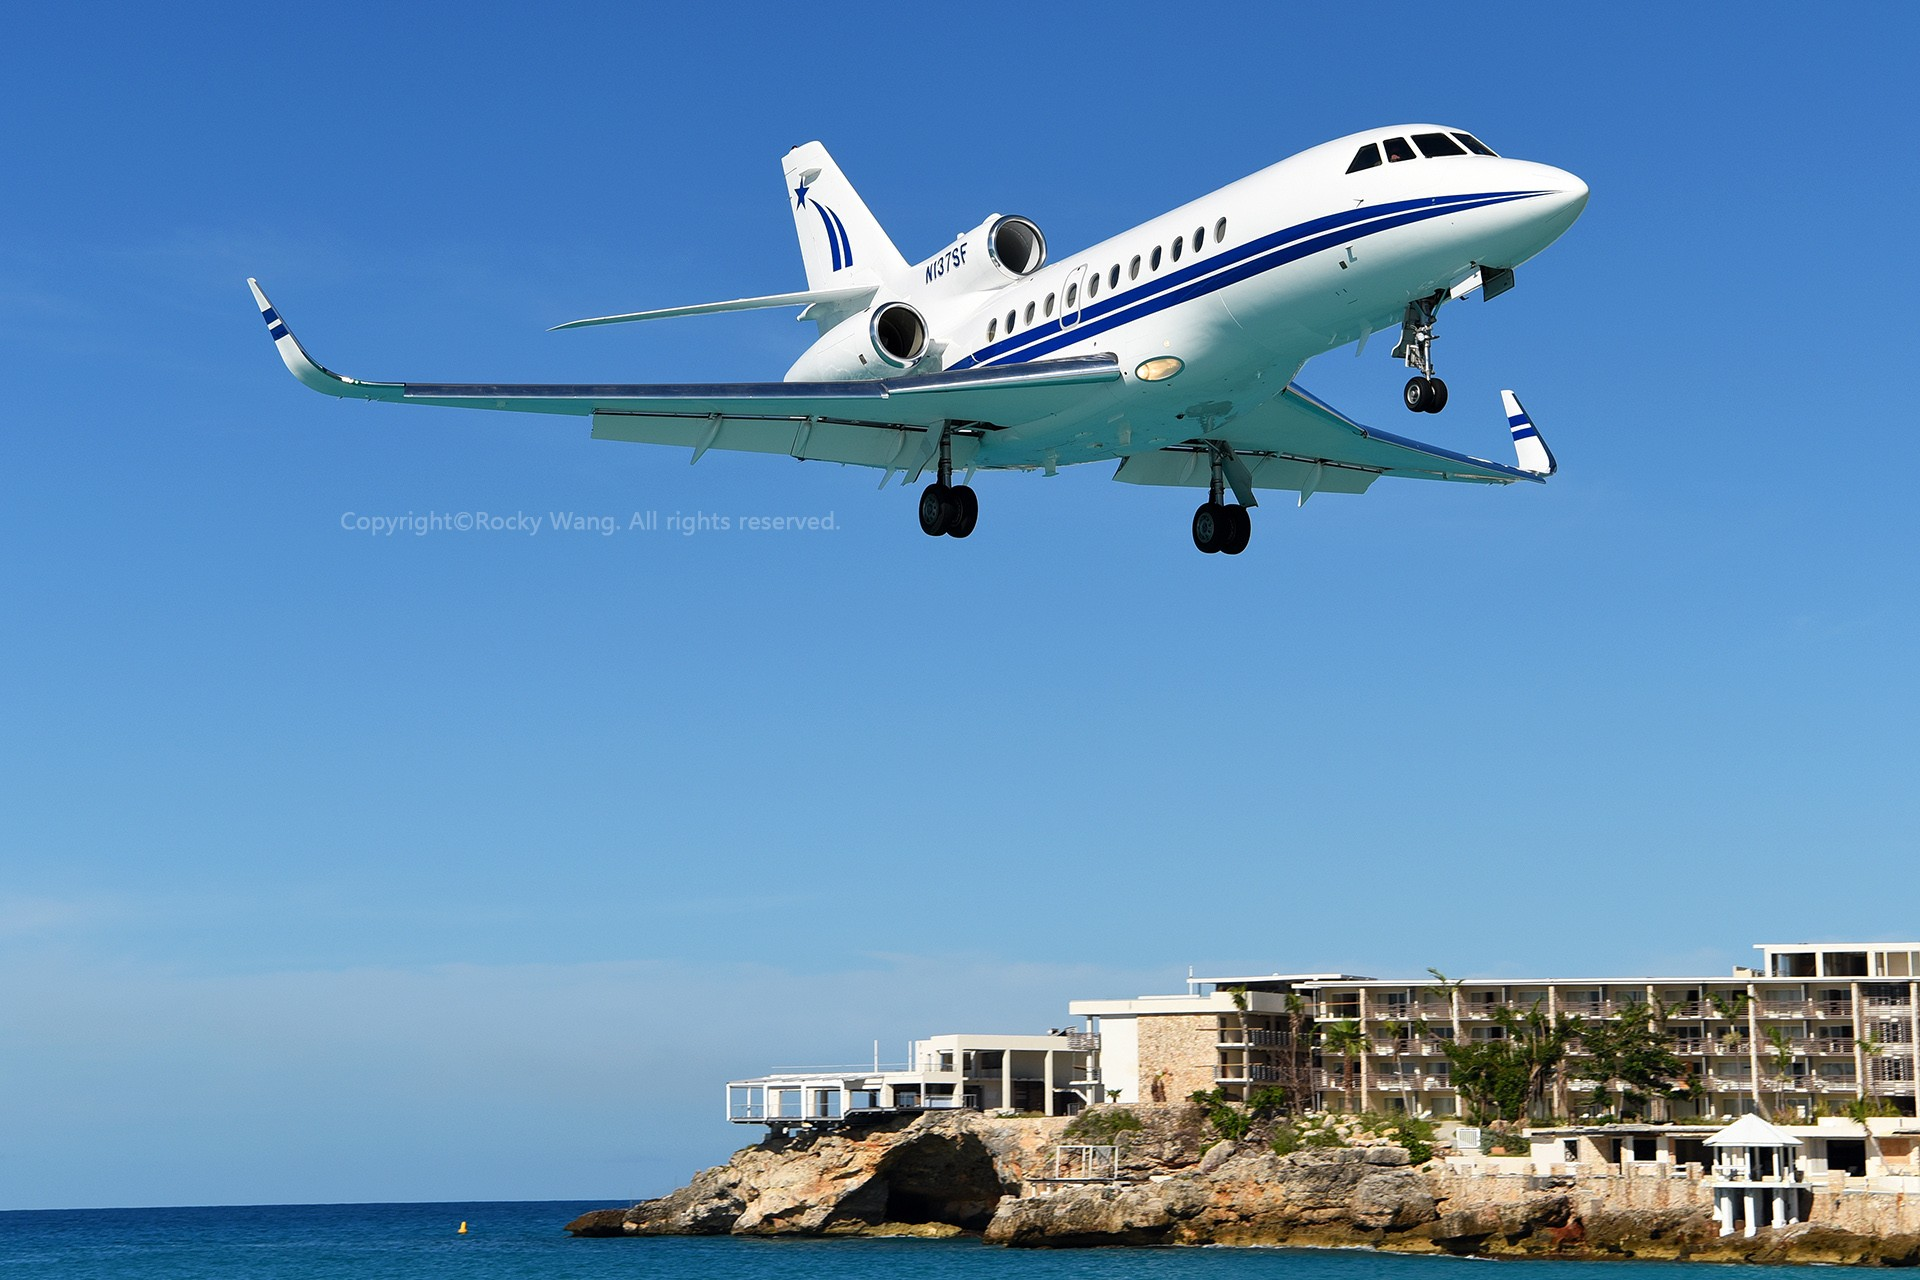 Re:[原创]My endless Caribbean dream——圣马丁朱莉安娜公主机场拍机记 DASSAULT FALCON 900EX N137SF 荷属安的列斯群岛朱利安娜公主机场